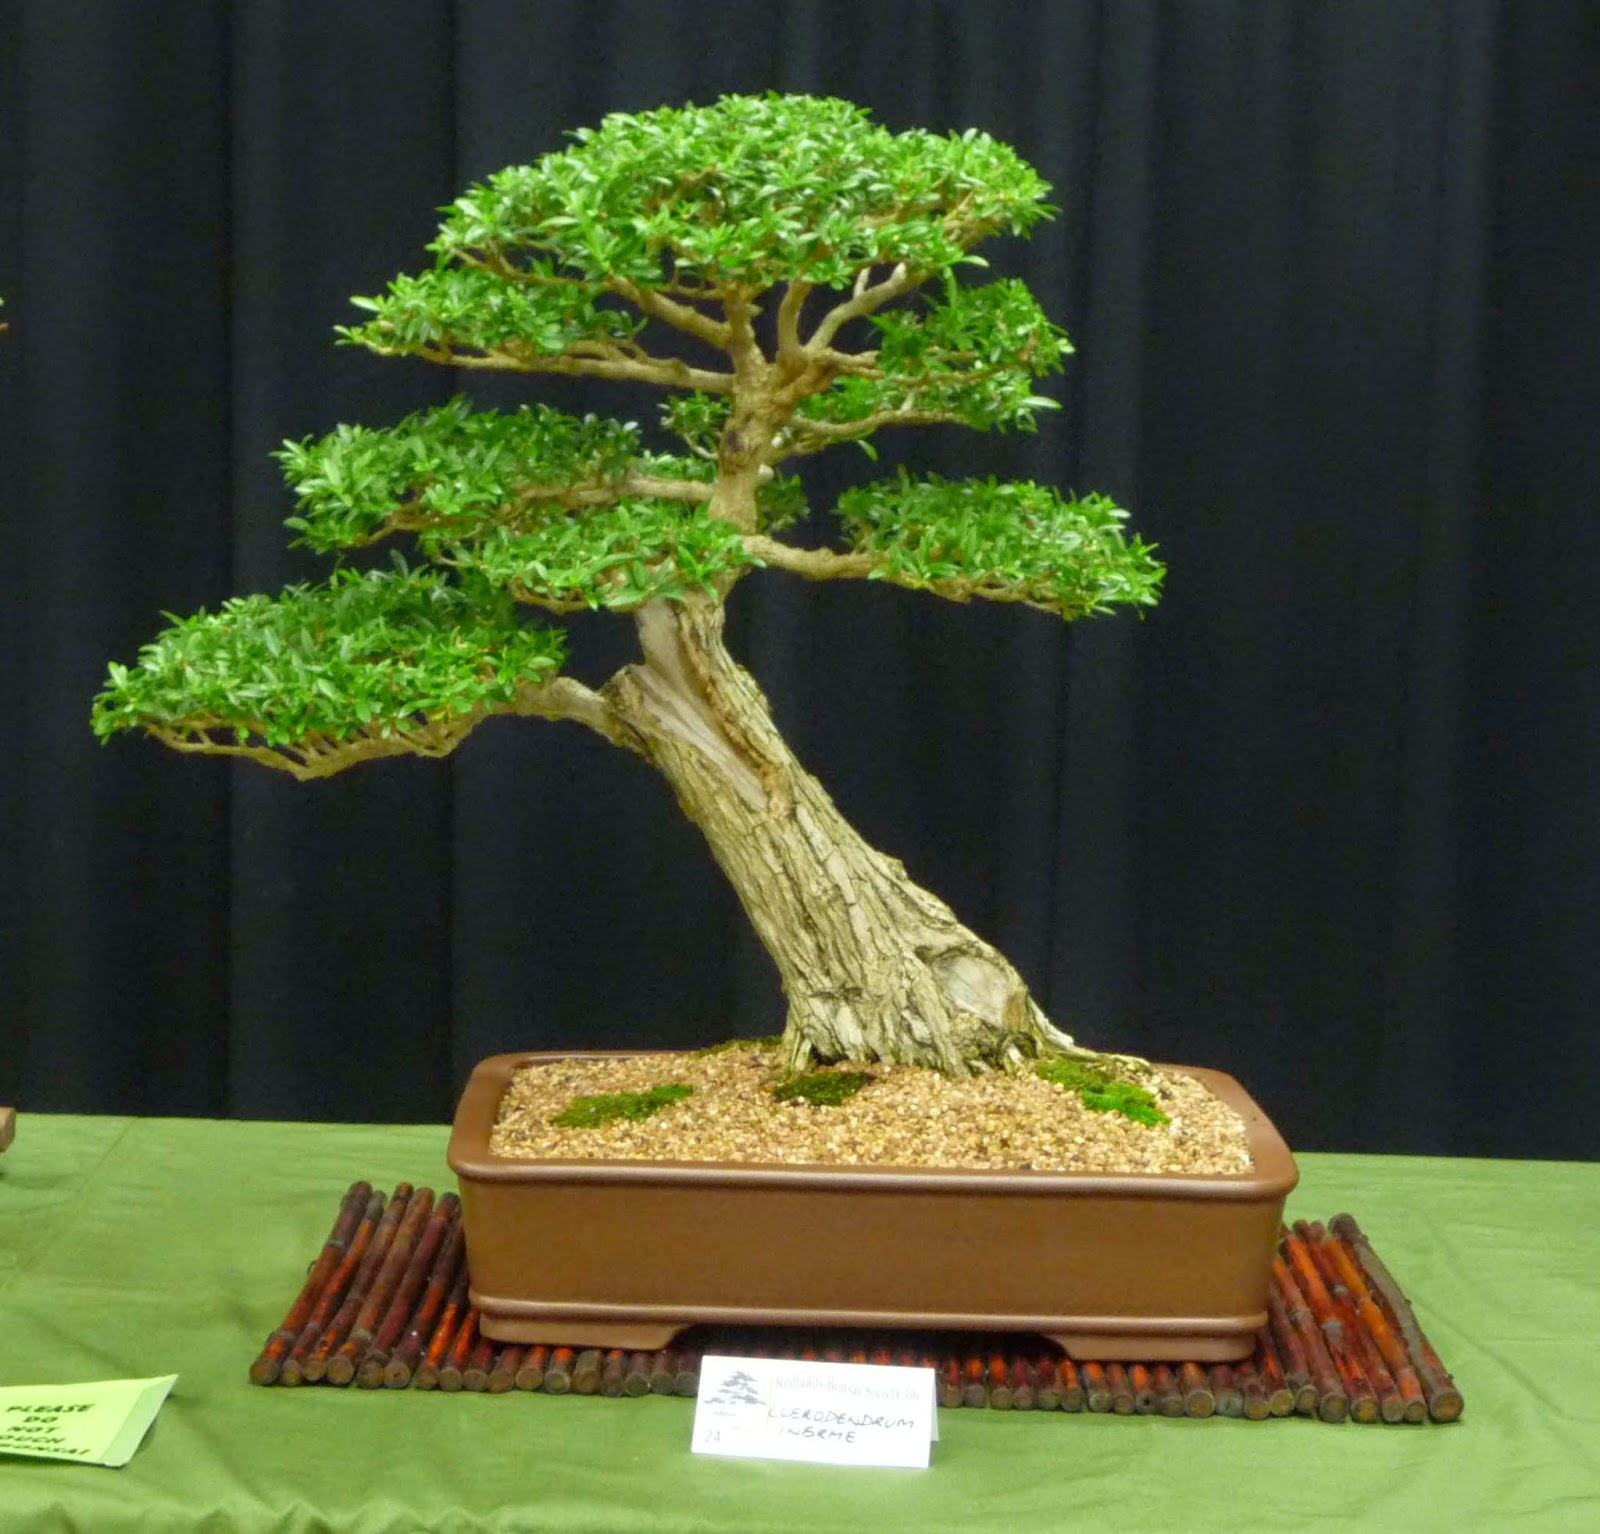 Bonsai Amp Pottery Post 150 Australian Native Bonsai Exhibition